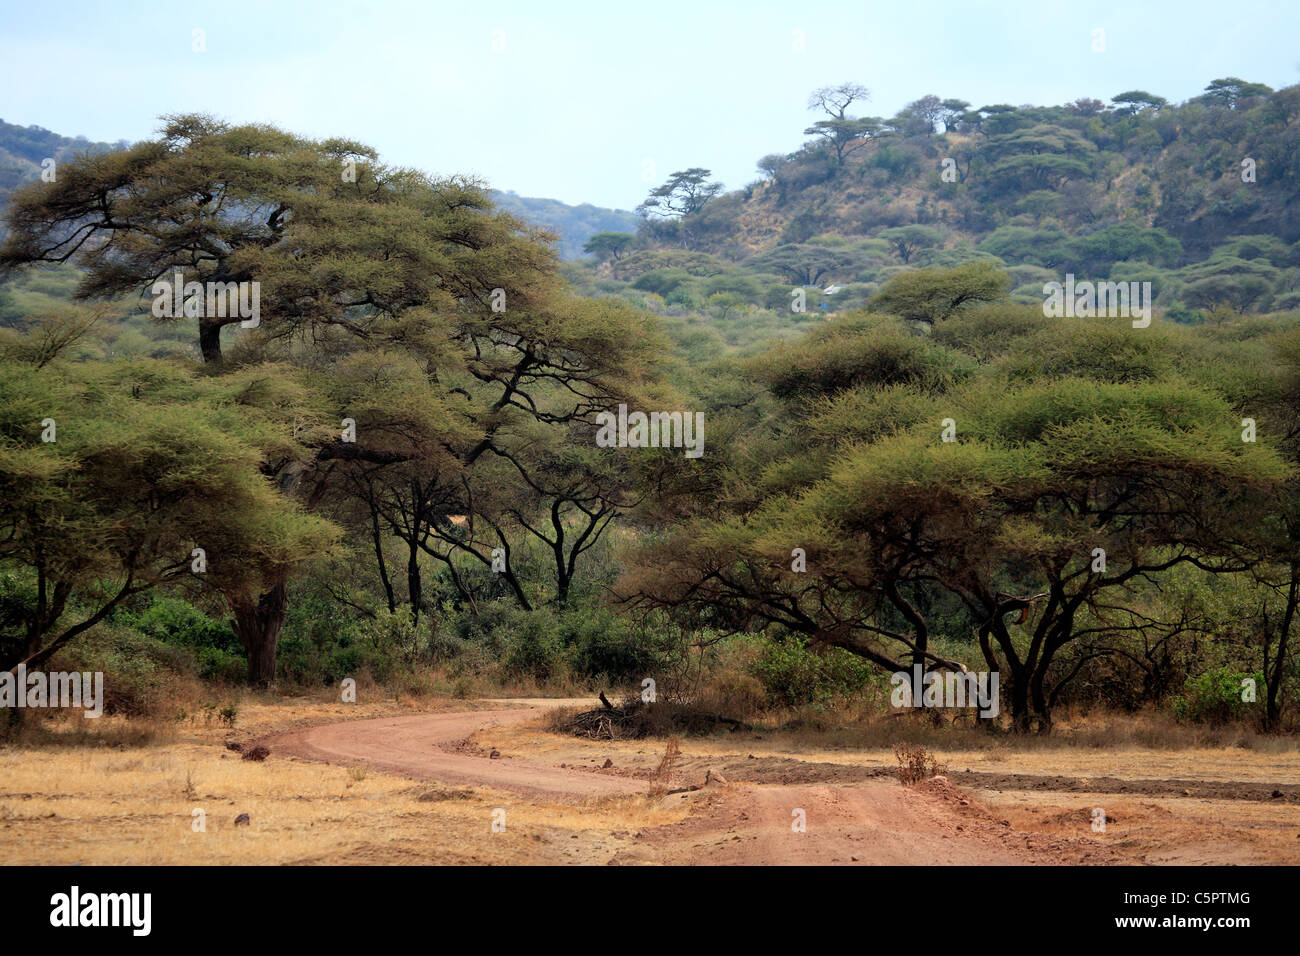 Lake Manyara National Park, Tanzania - Stock Image